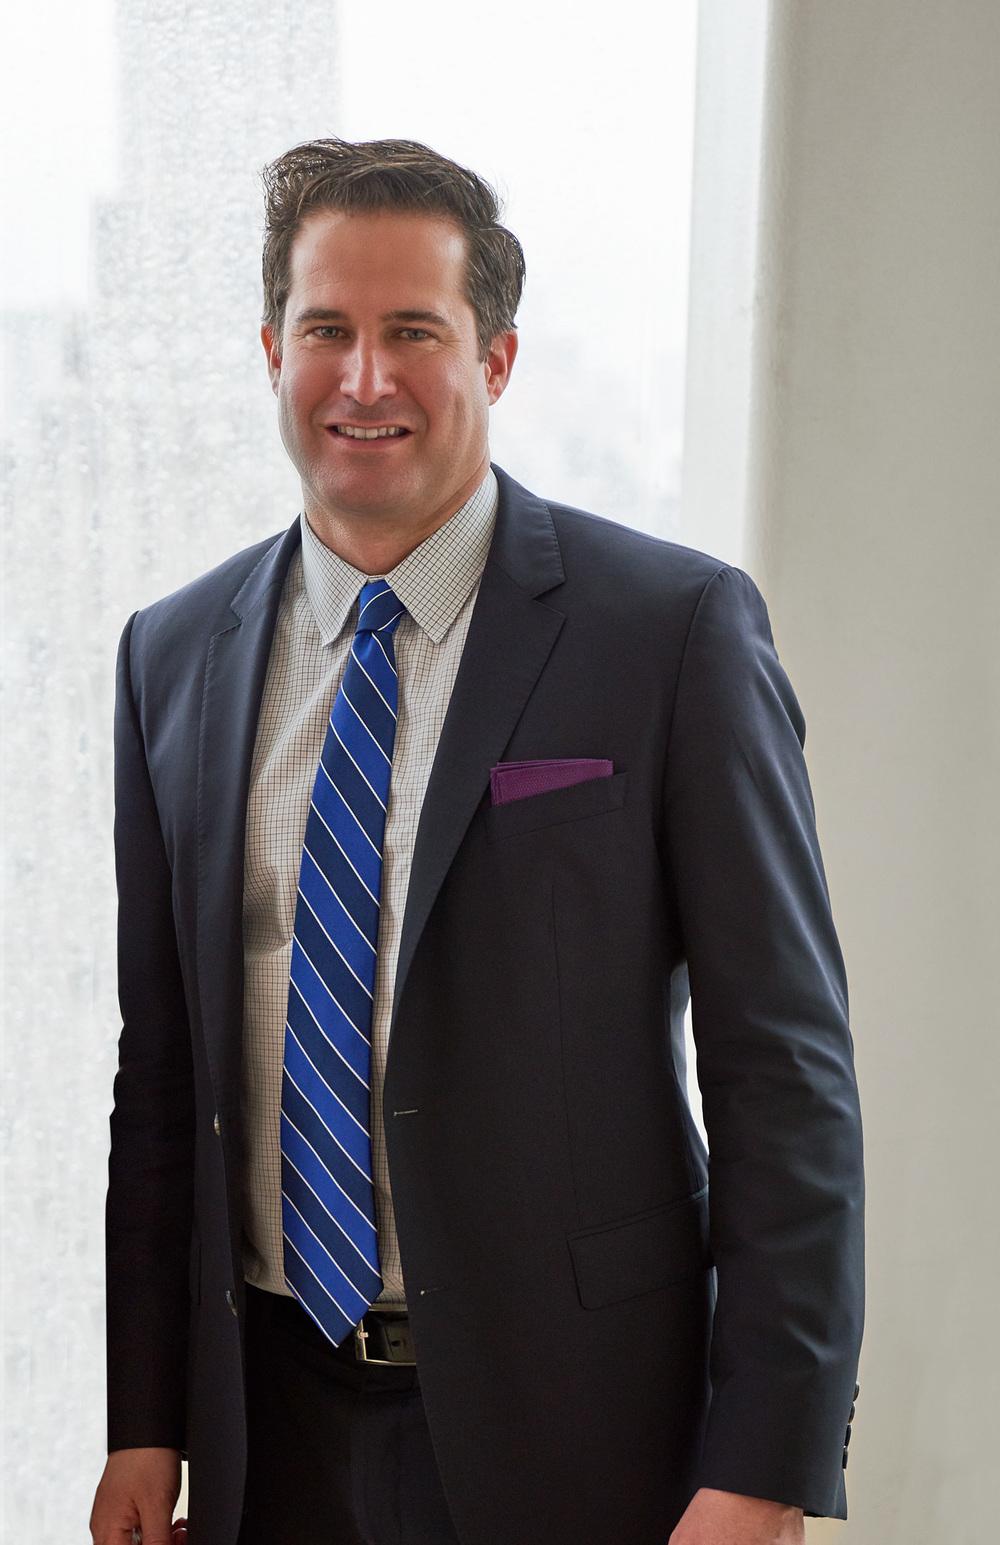 U.S. Representative Seth Moulton